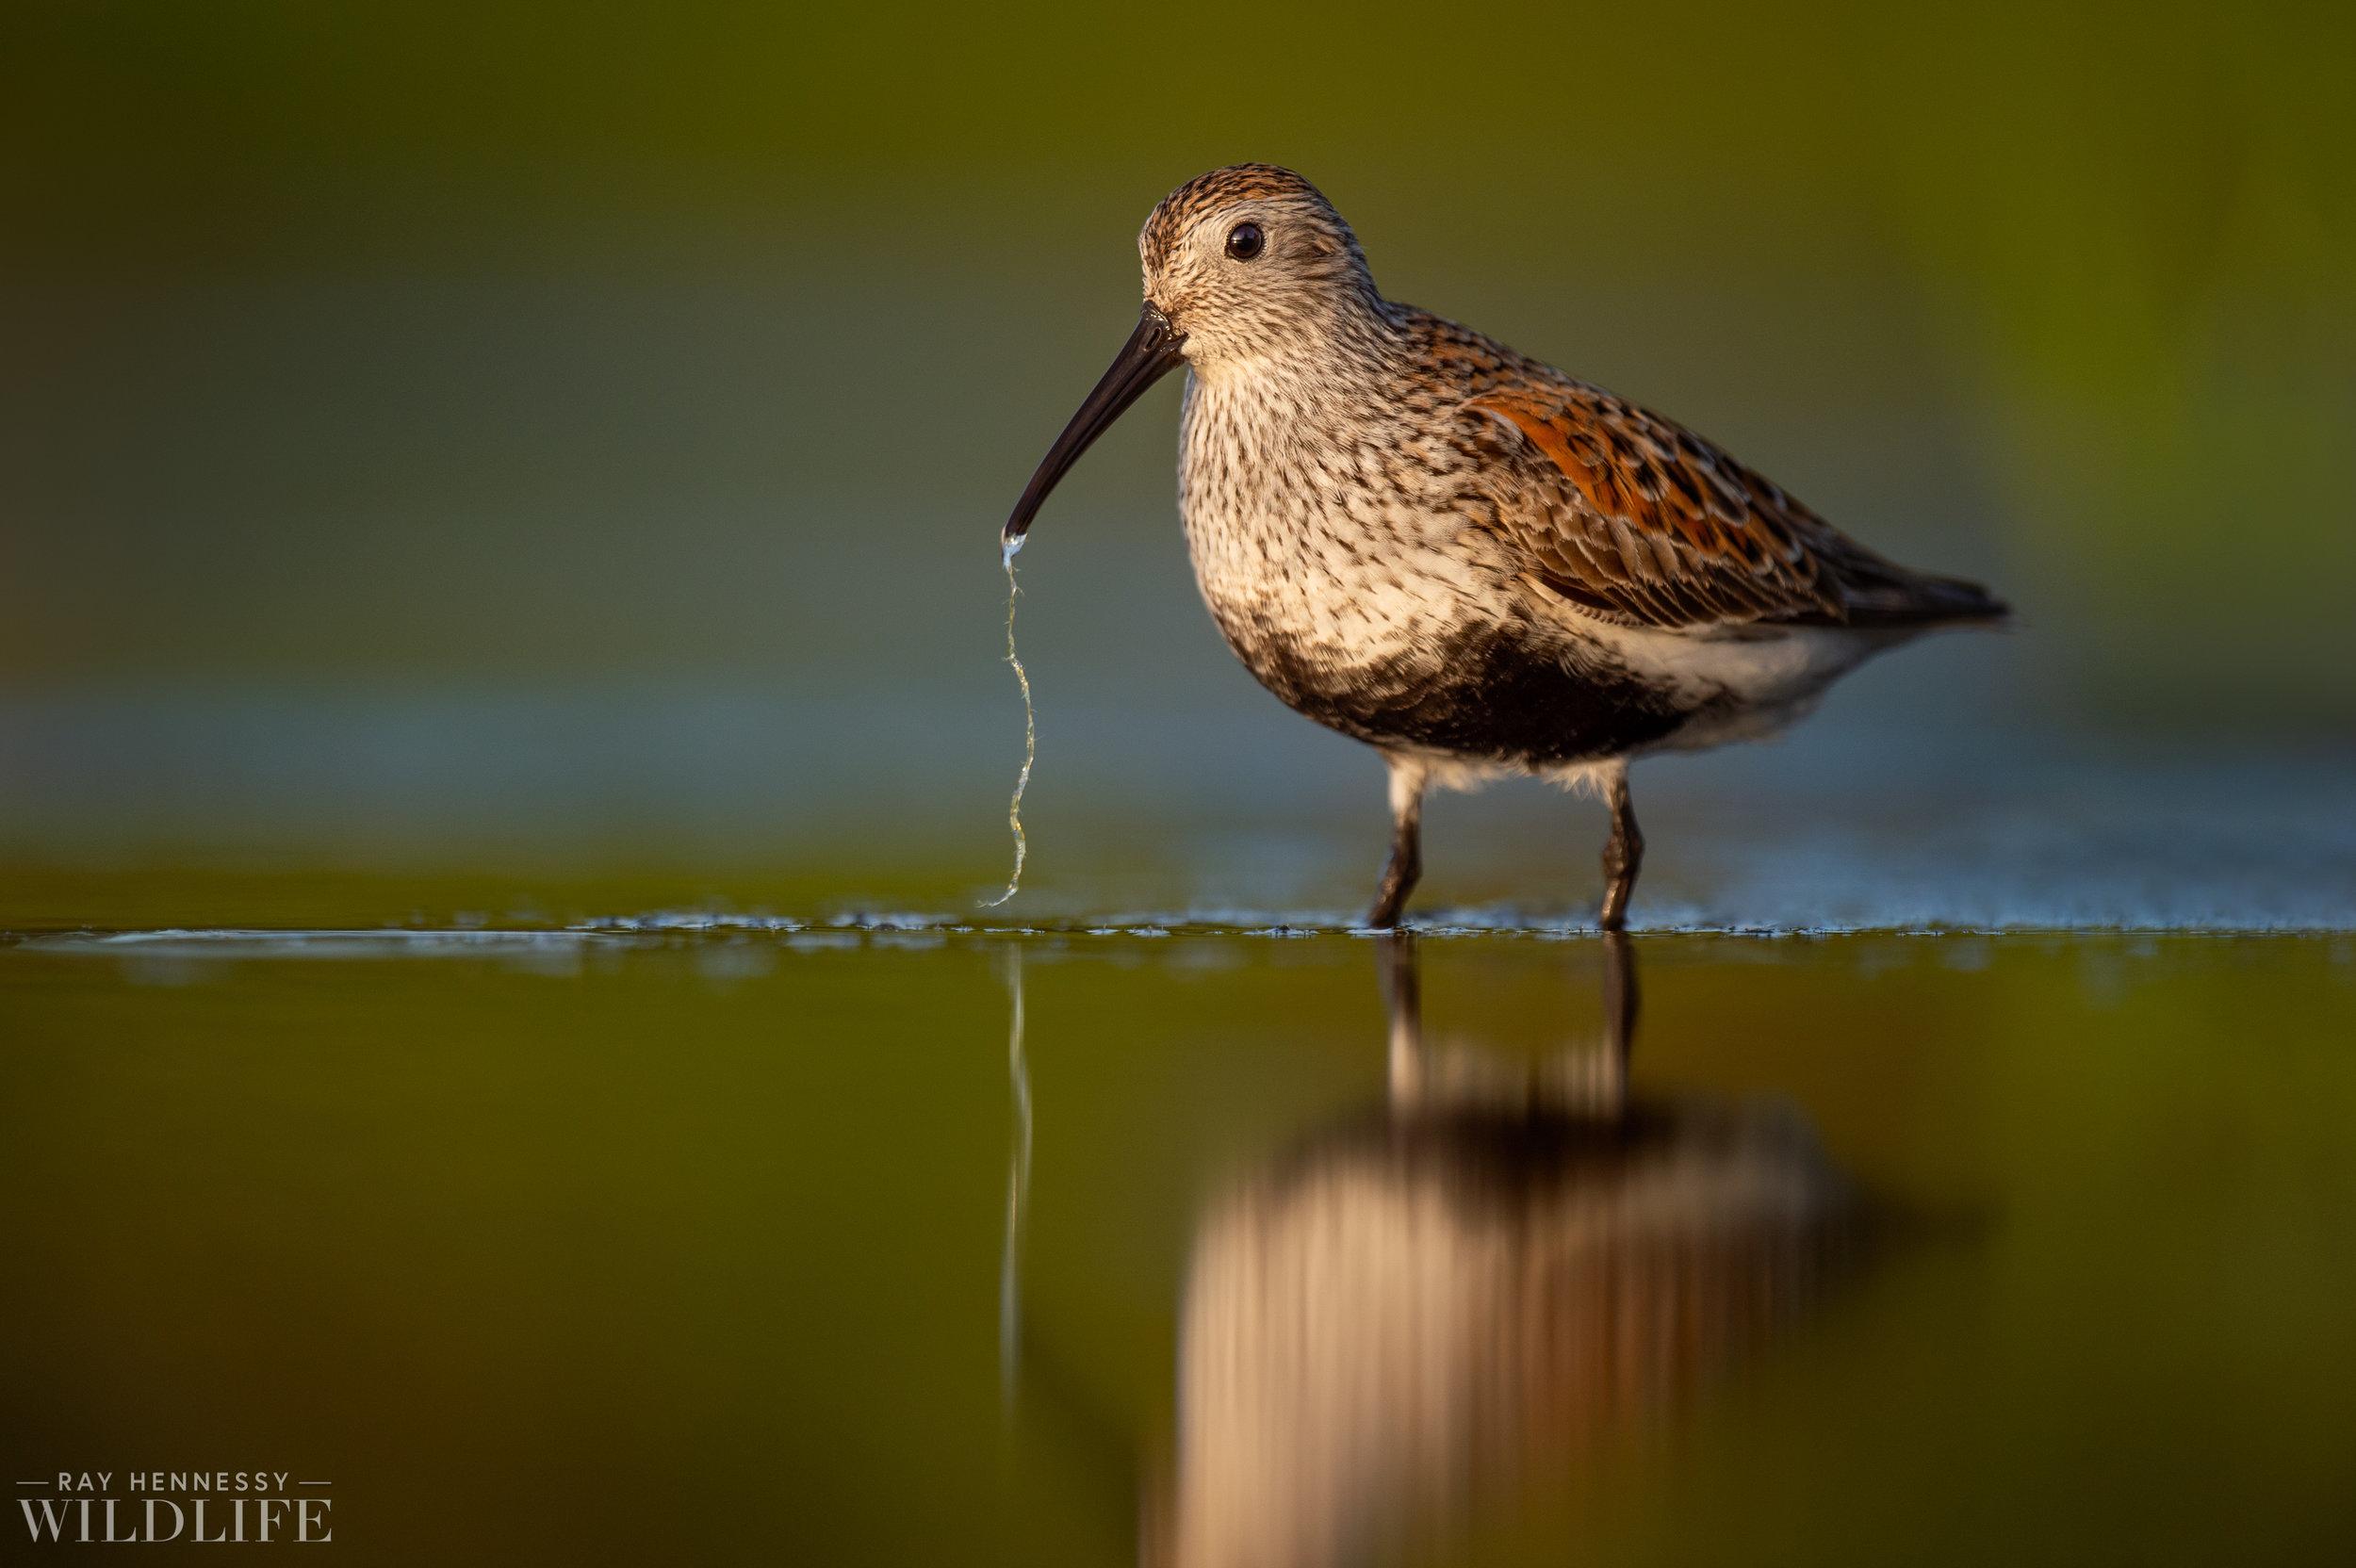 014_shorebirds-prothonotary-warbler.jpg